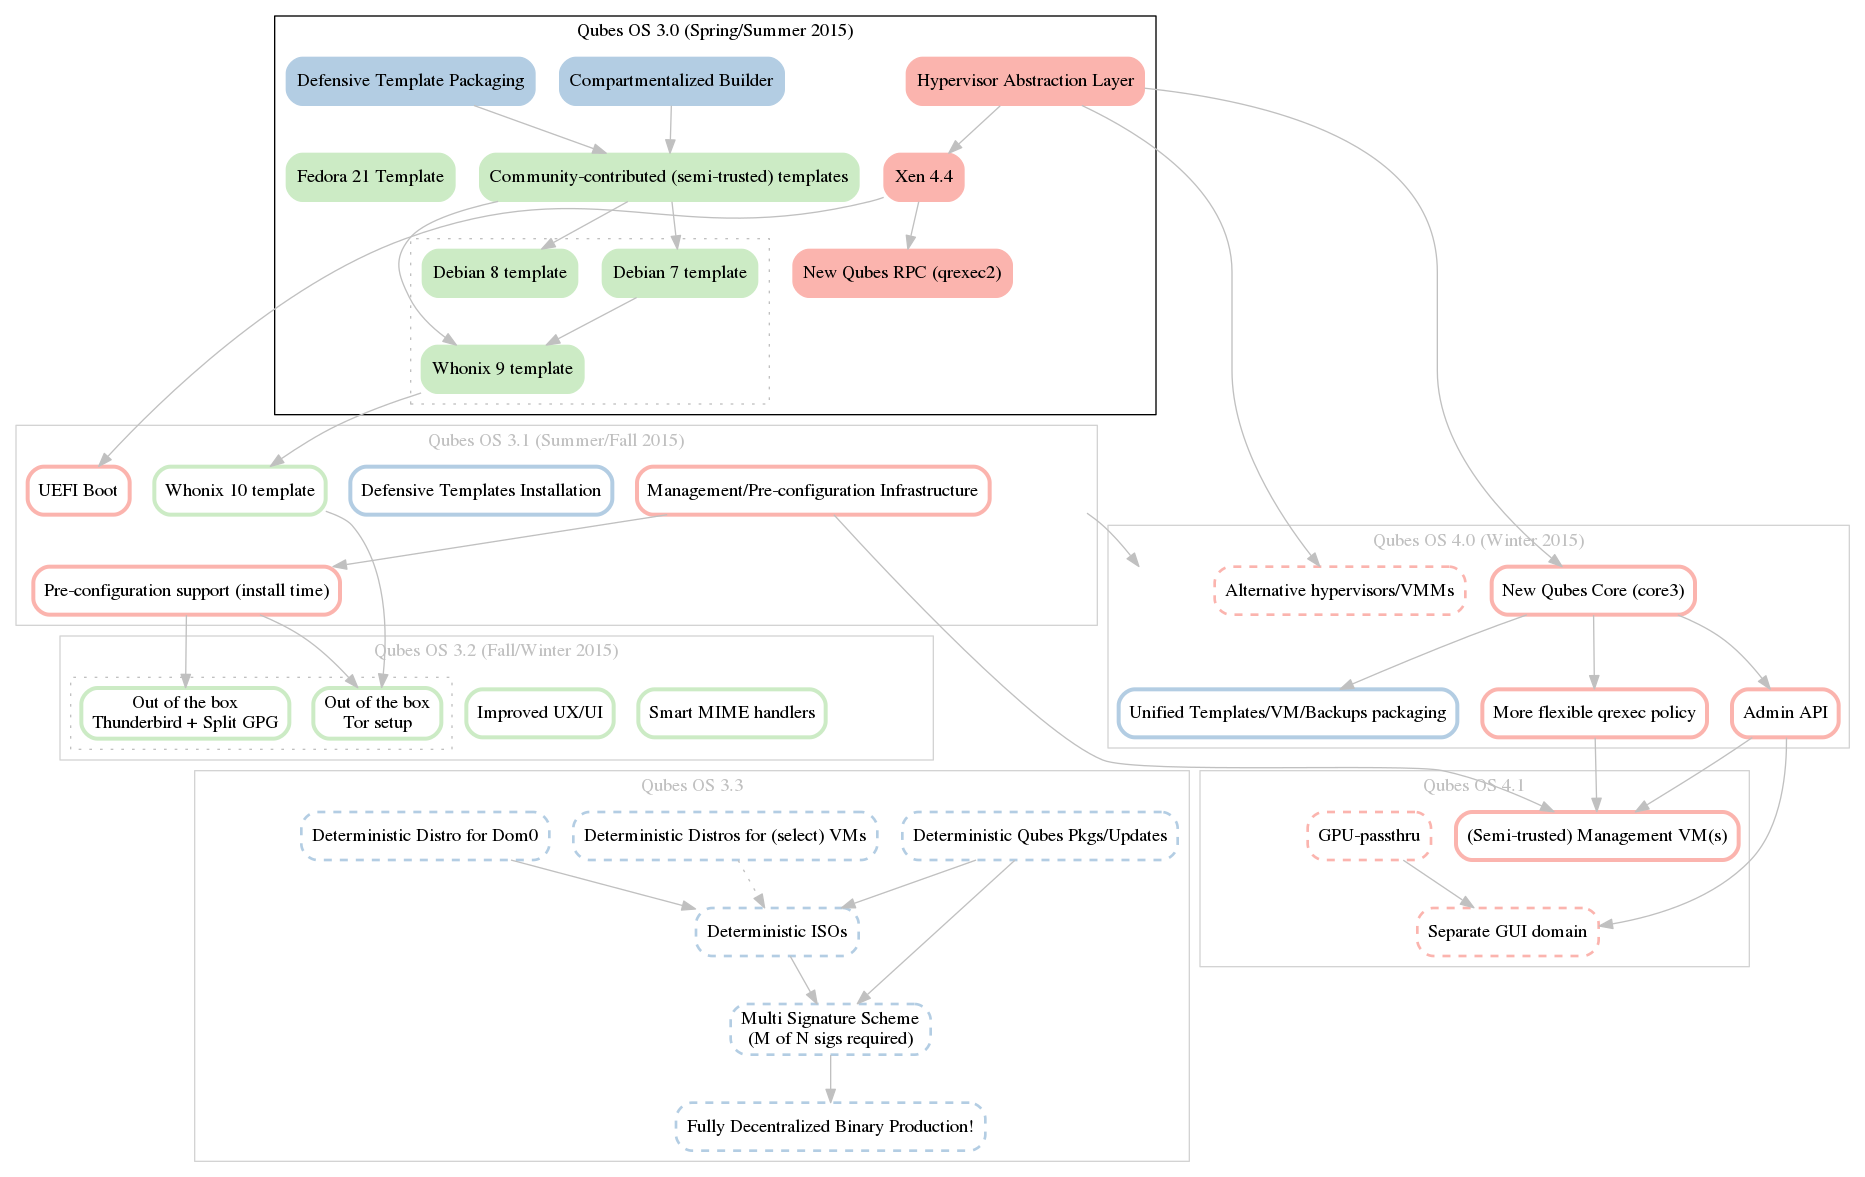 Qubes Roadmap for 2015